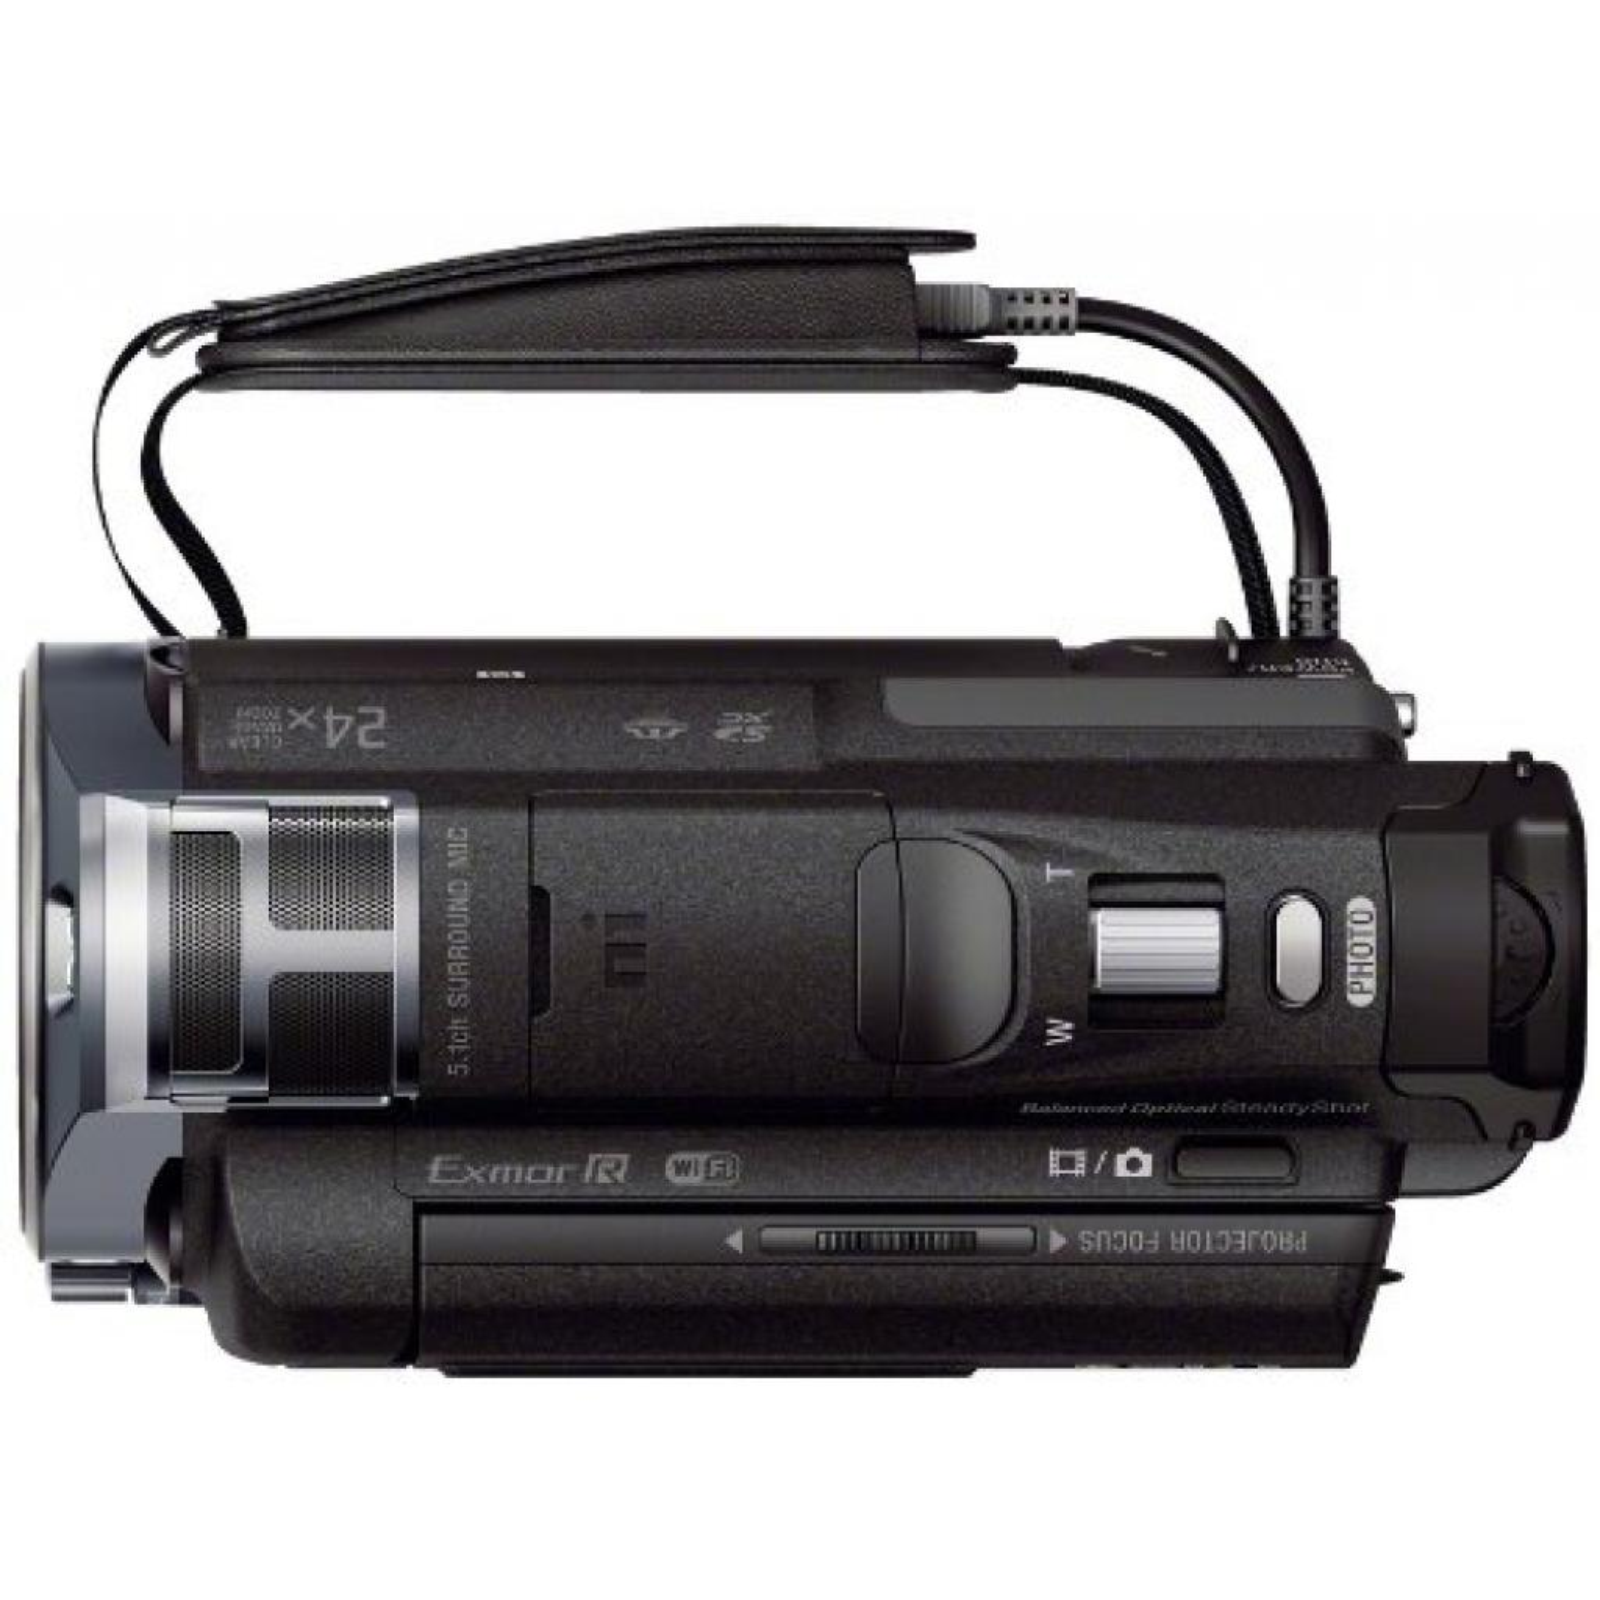 Цифровая видеокамера SONY Handycam HDR-PJ810 Black (HDRPJ810EB.CEL) изображение 8